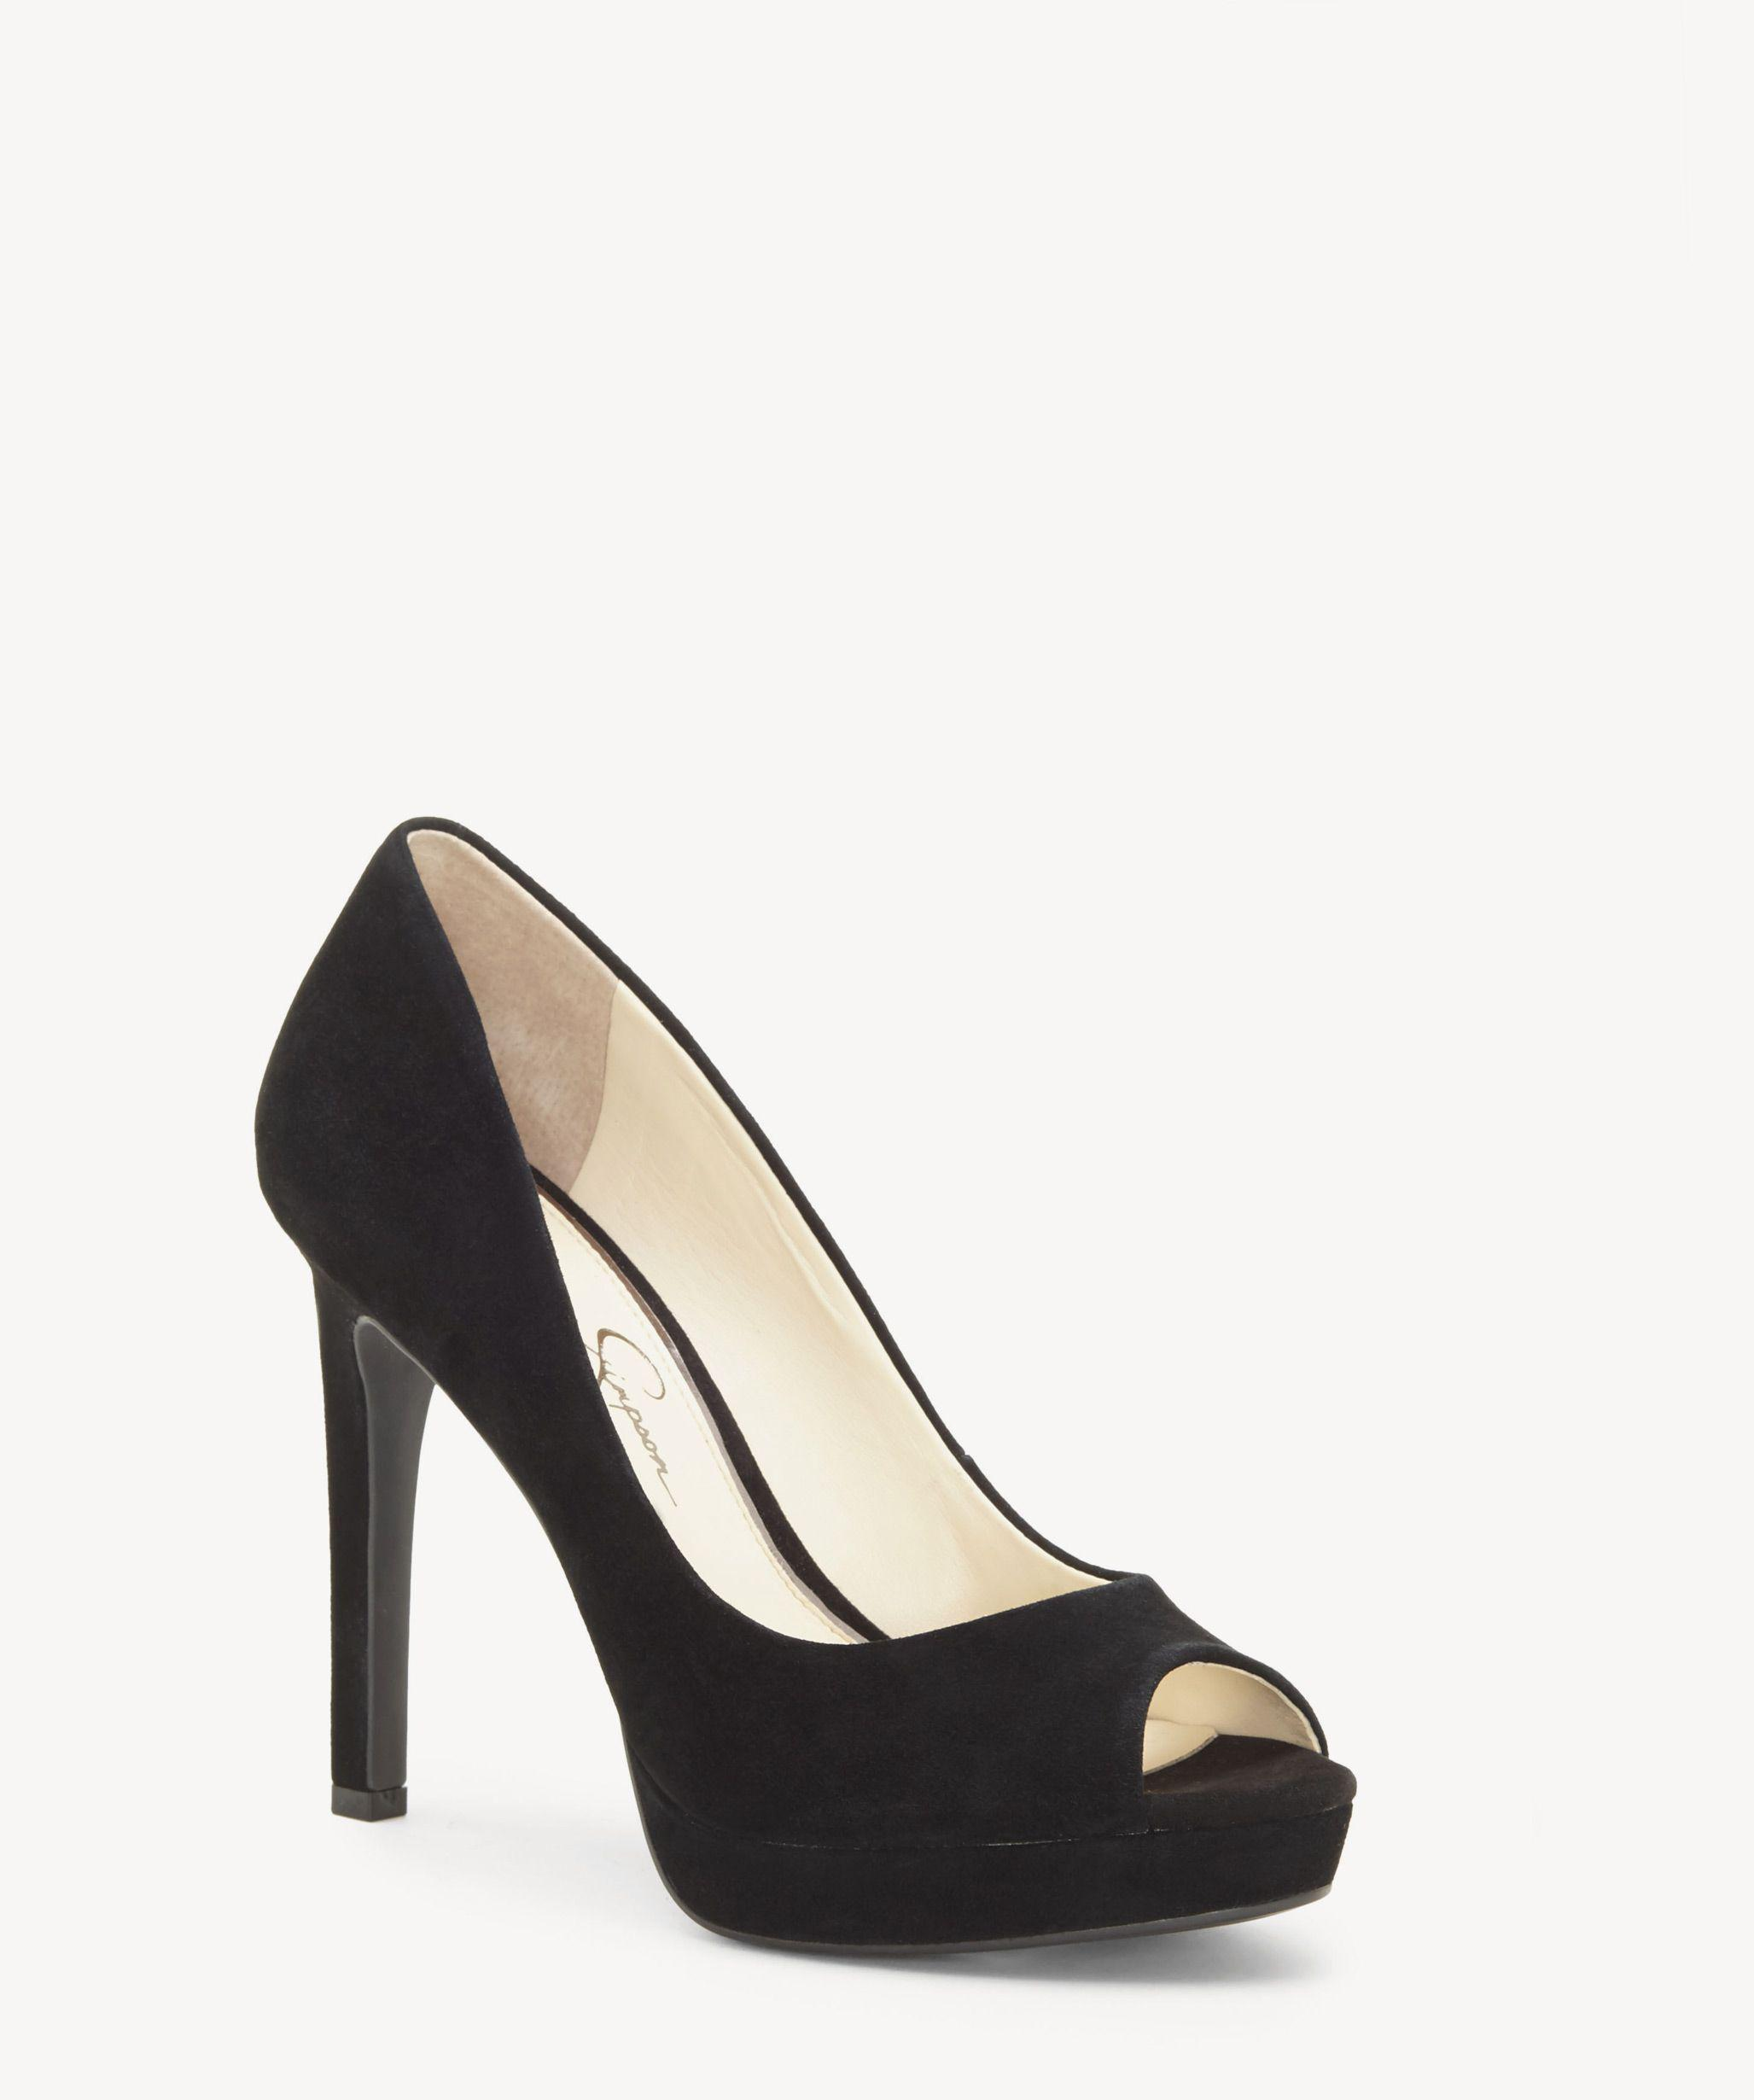 c80b253e7ac Lyst - Jessica Simpson Dalyn Peep Toe Sandal in Black - Save 10%